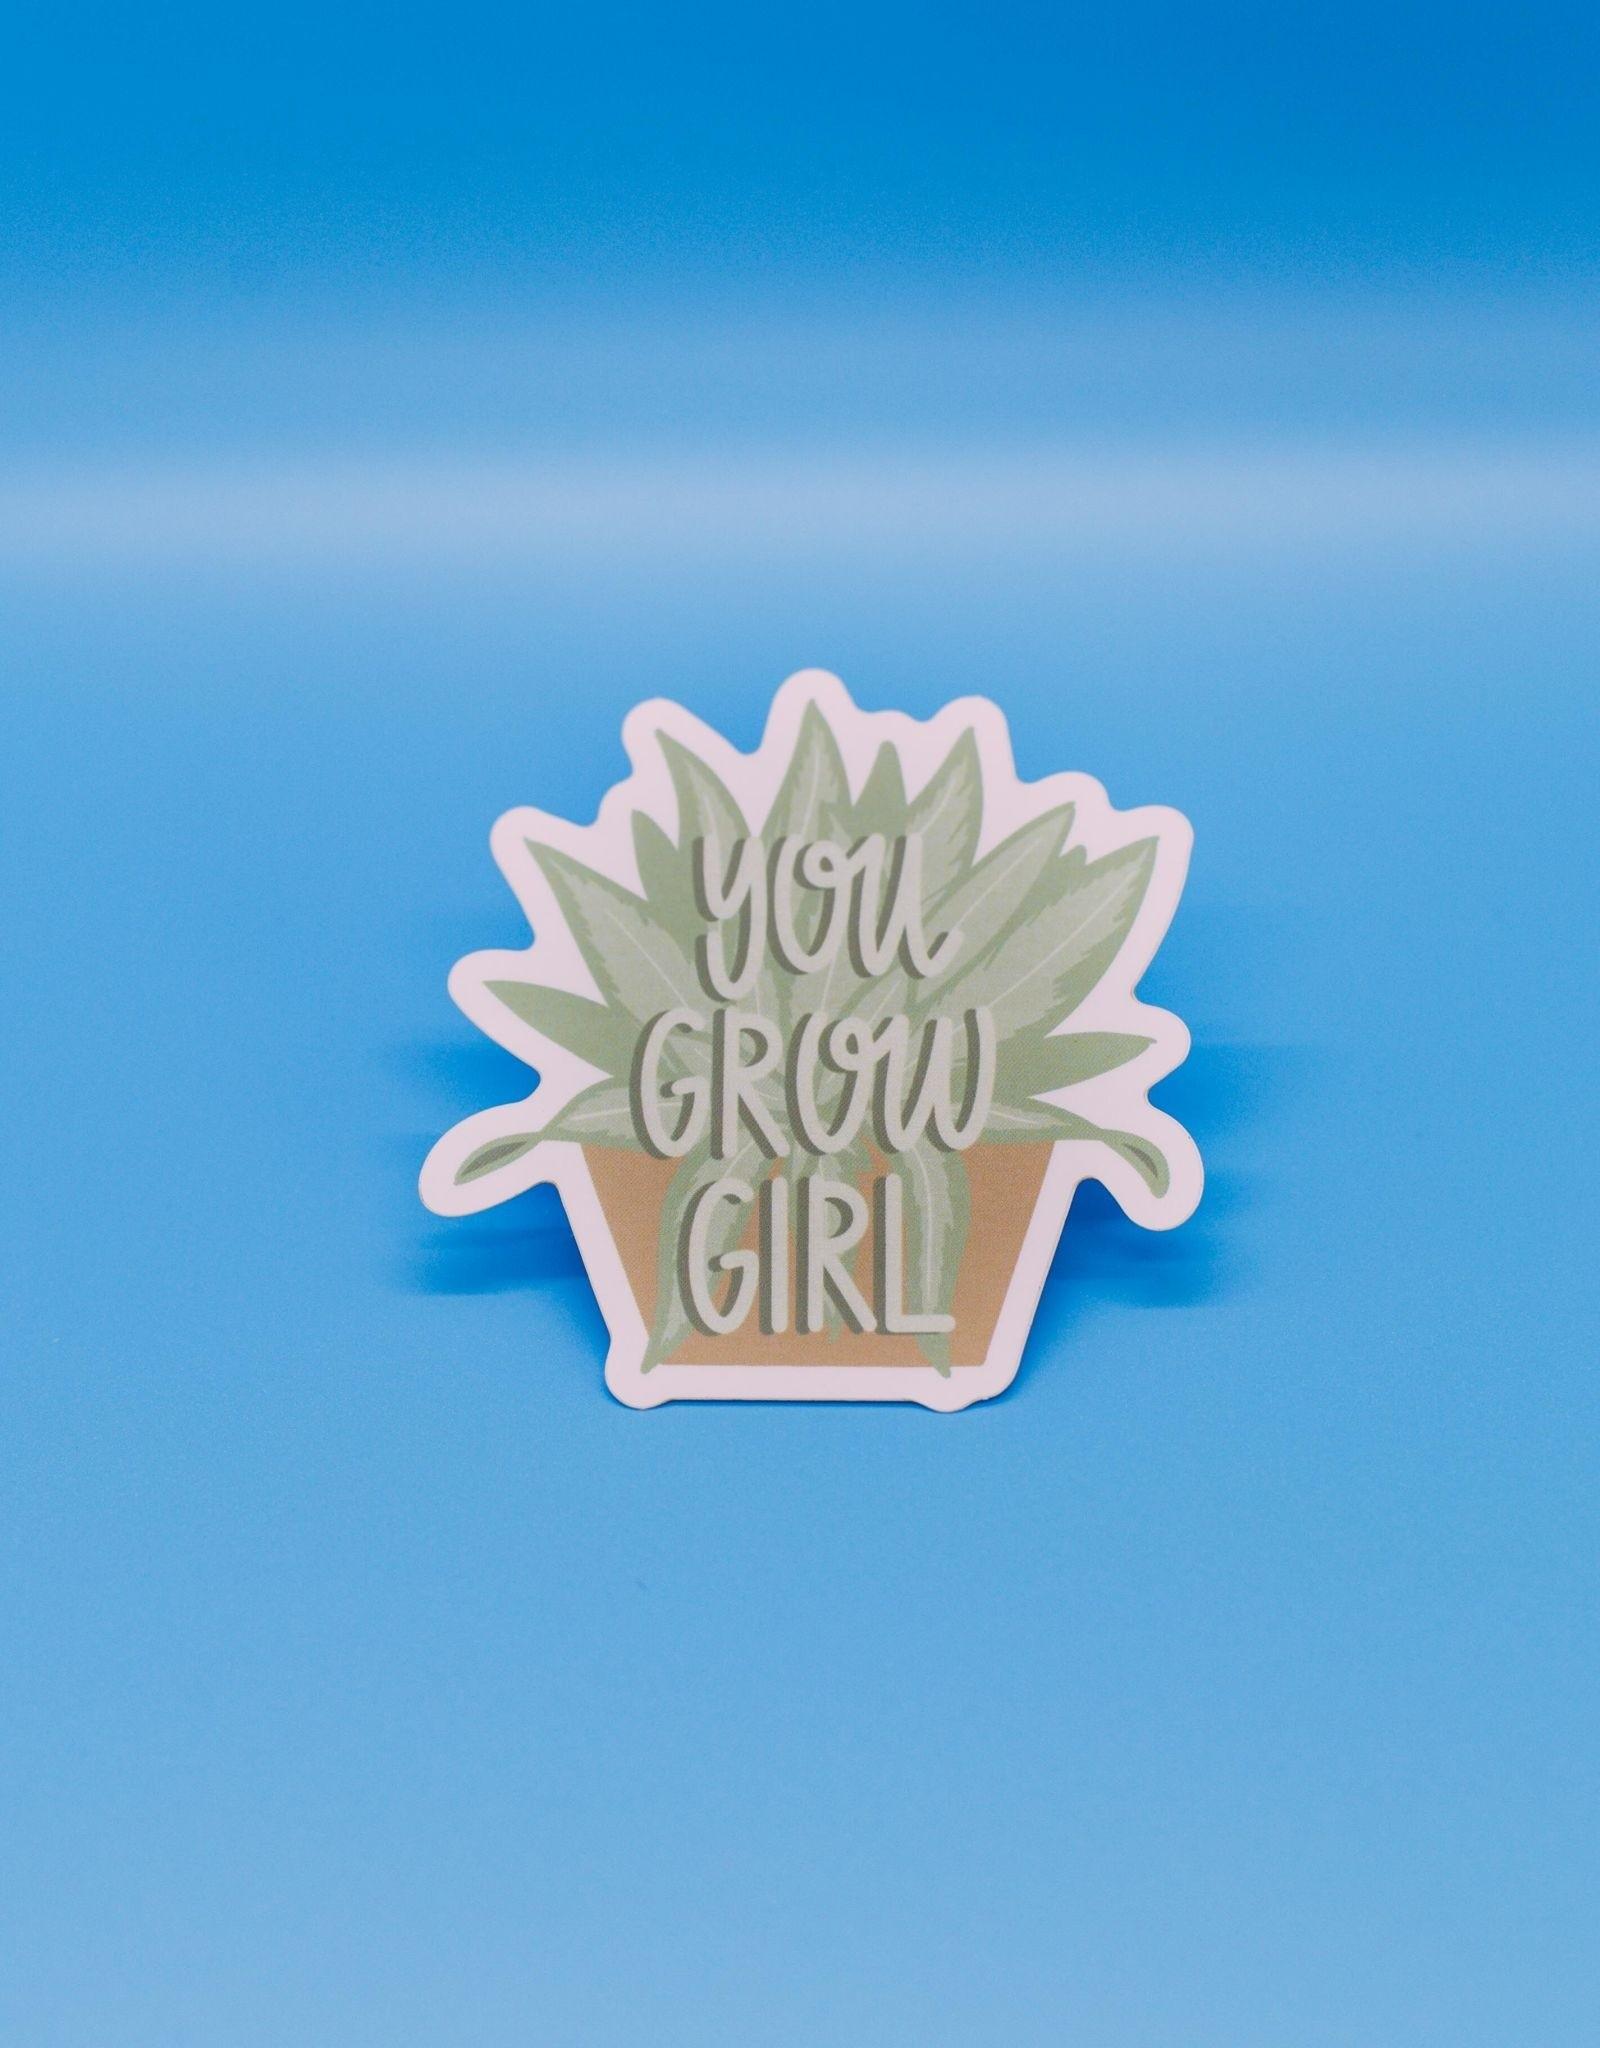 Cardinal Directions CD Stickers - You Grow Girl